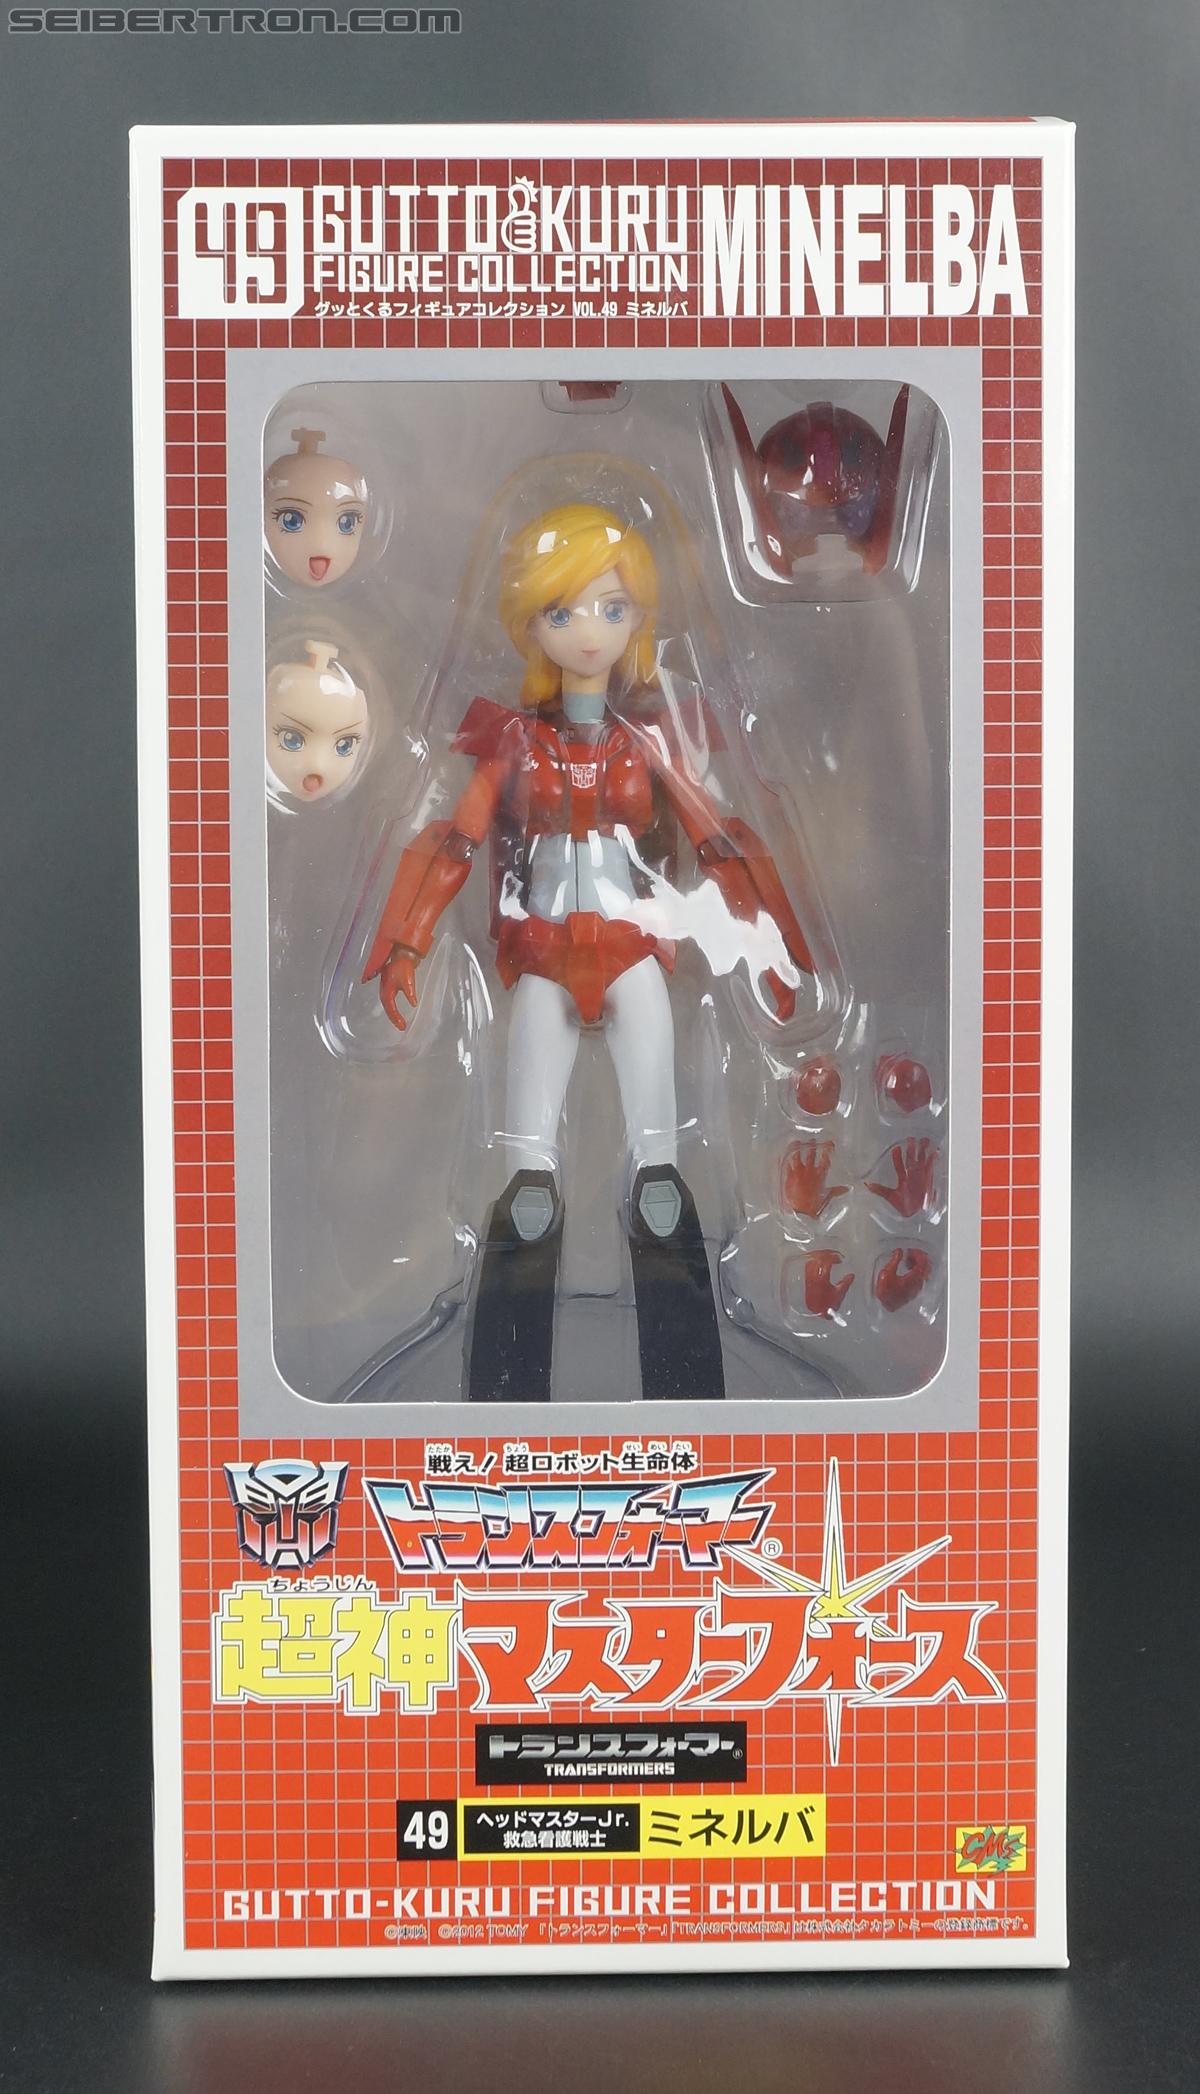 Transformers Gutto Kuru Figure Collection Minelba (Minerva) (Image #1 of 148)